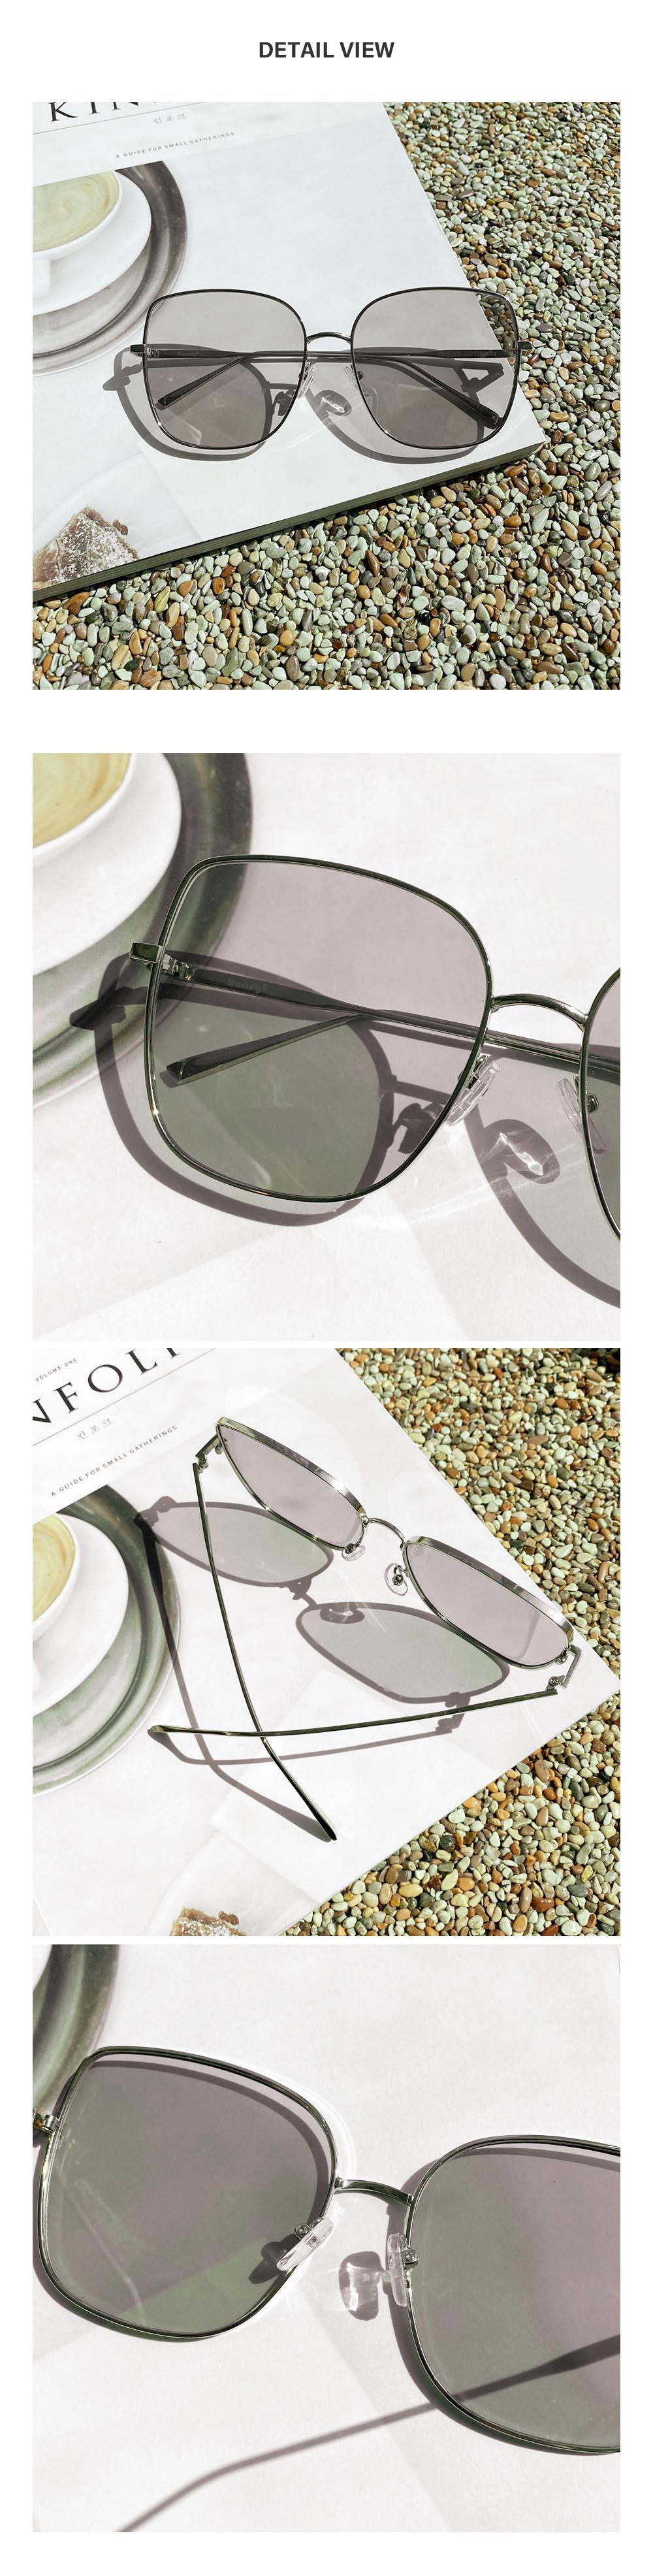 over cats square sunglasses